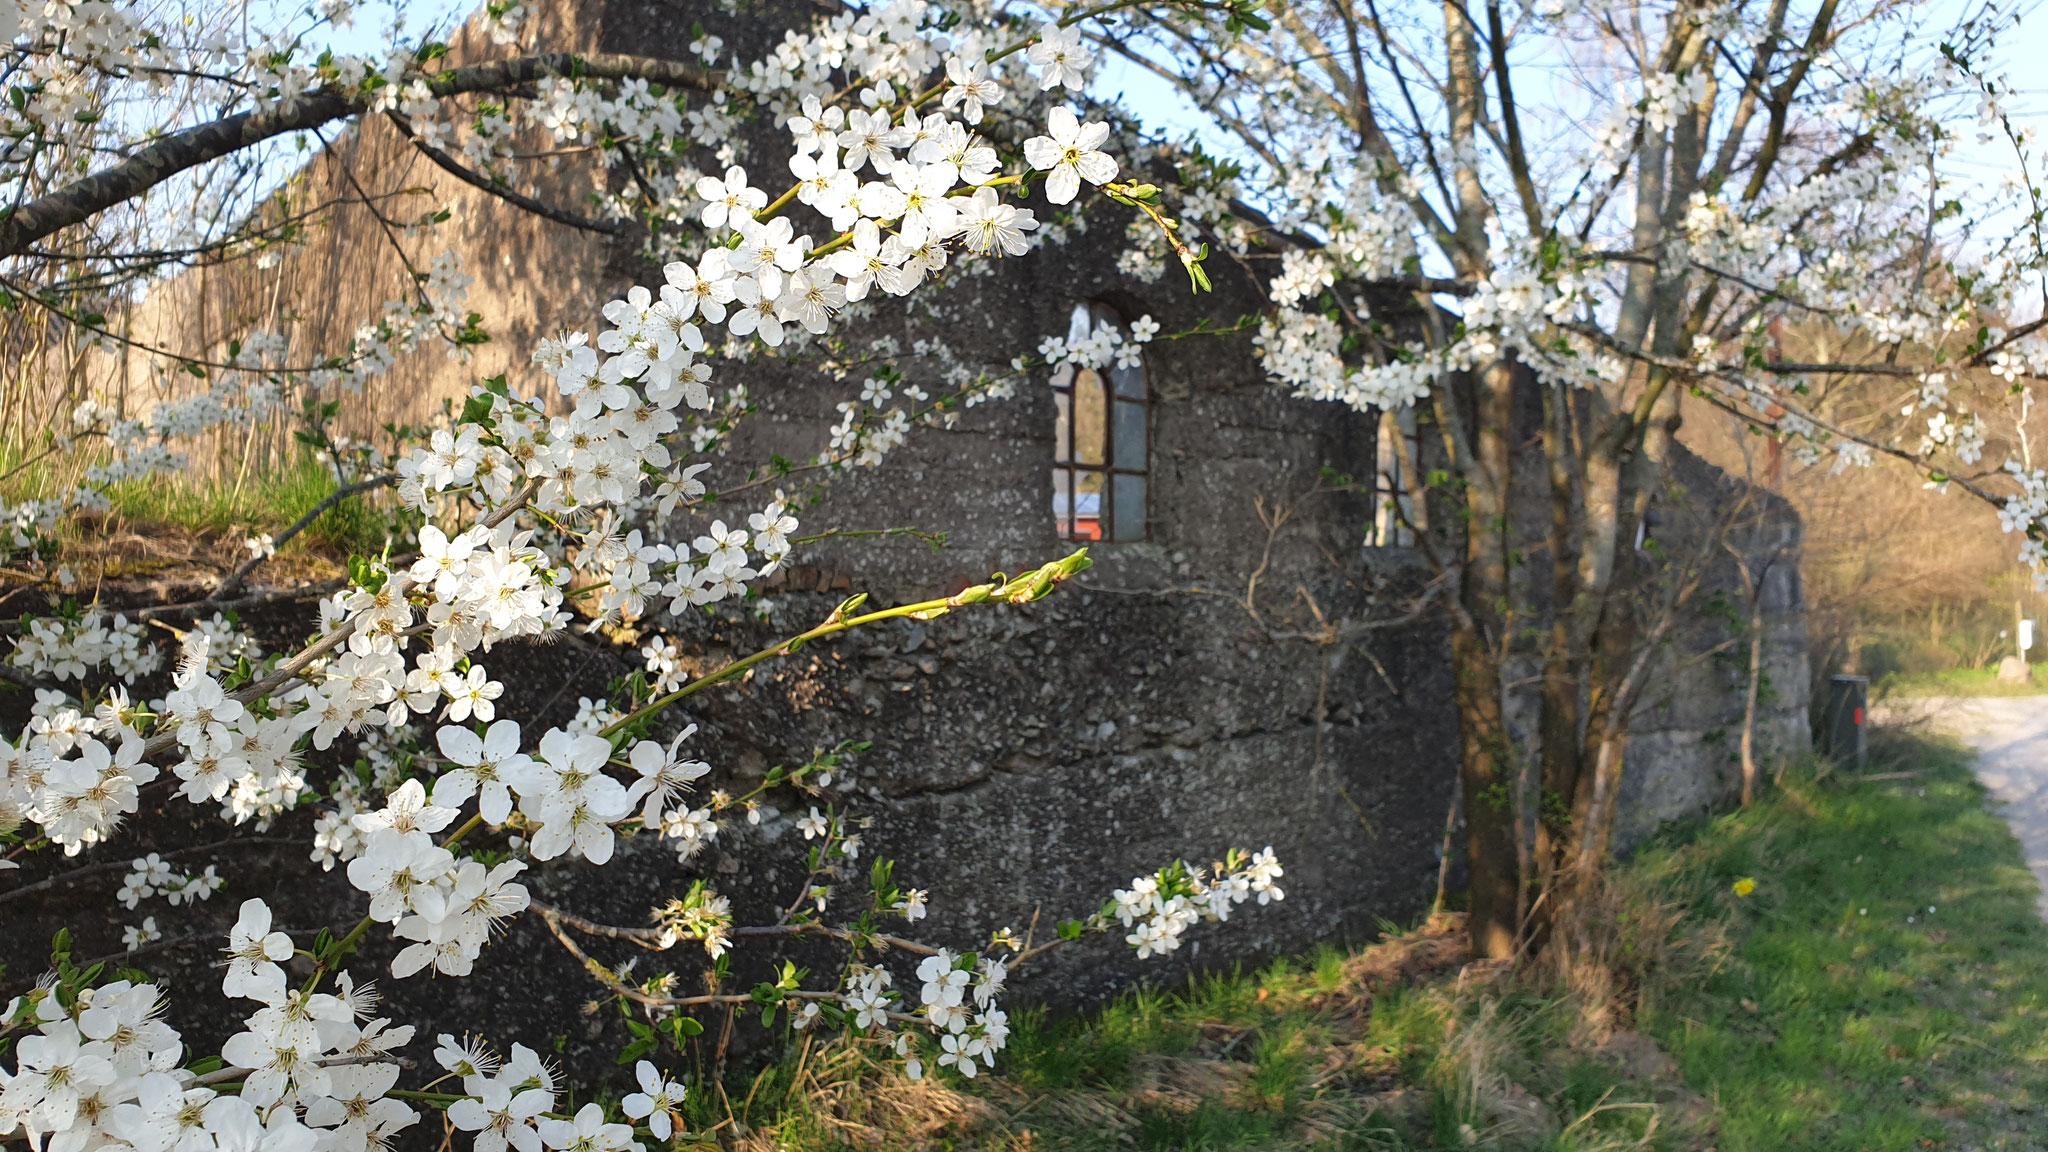 Spaziergang - Blütenpracht vor altem Gemäuer